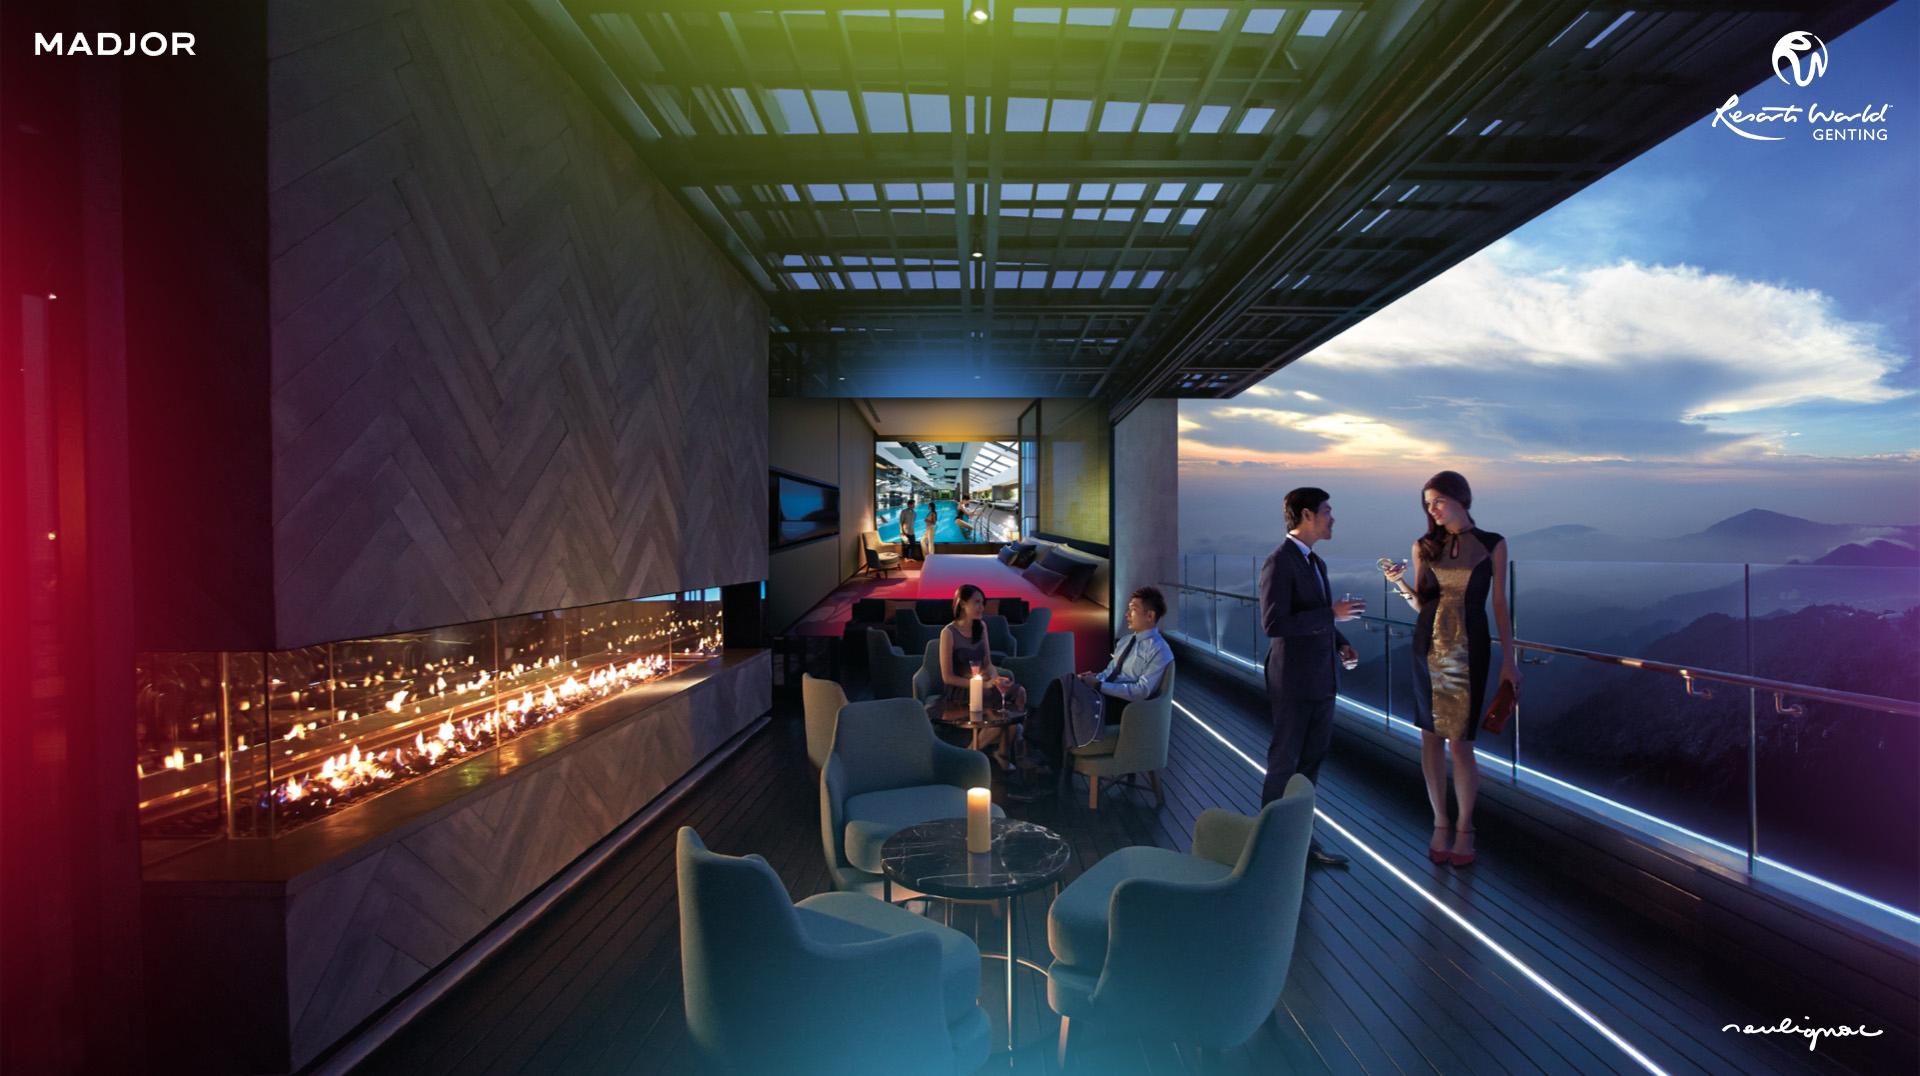 Resorts World Genting   Genting Highlands Resort   Malaysia   China Campaign - Francois Soulignac - Digital Creative and Art Direction - MADJOR Labbrand Shanghai, China